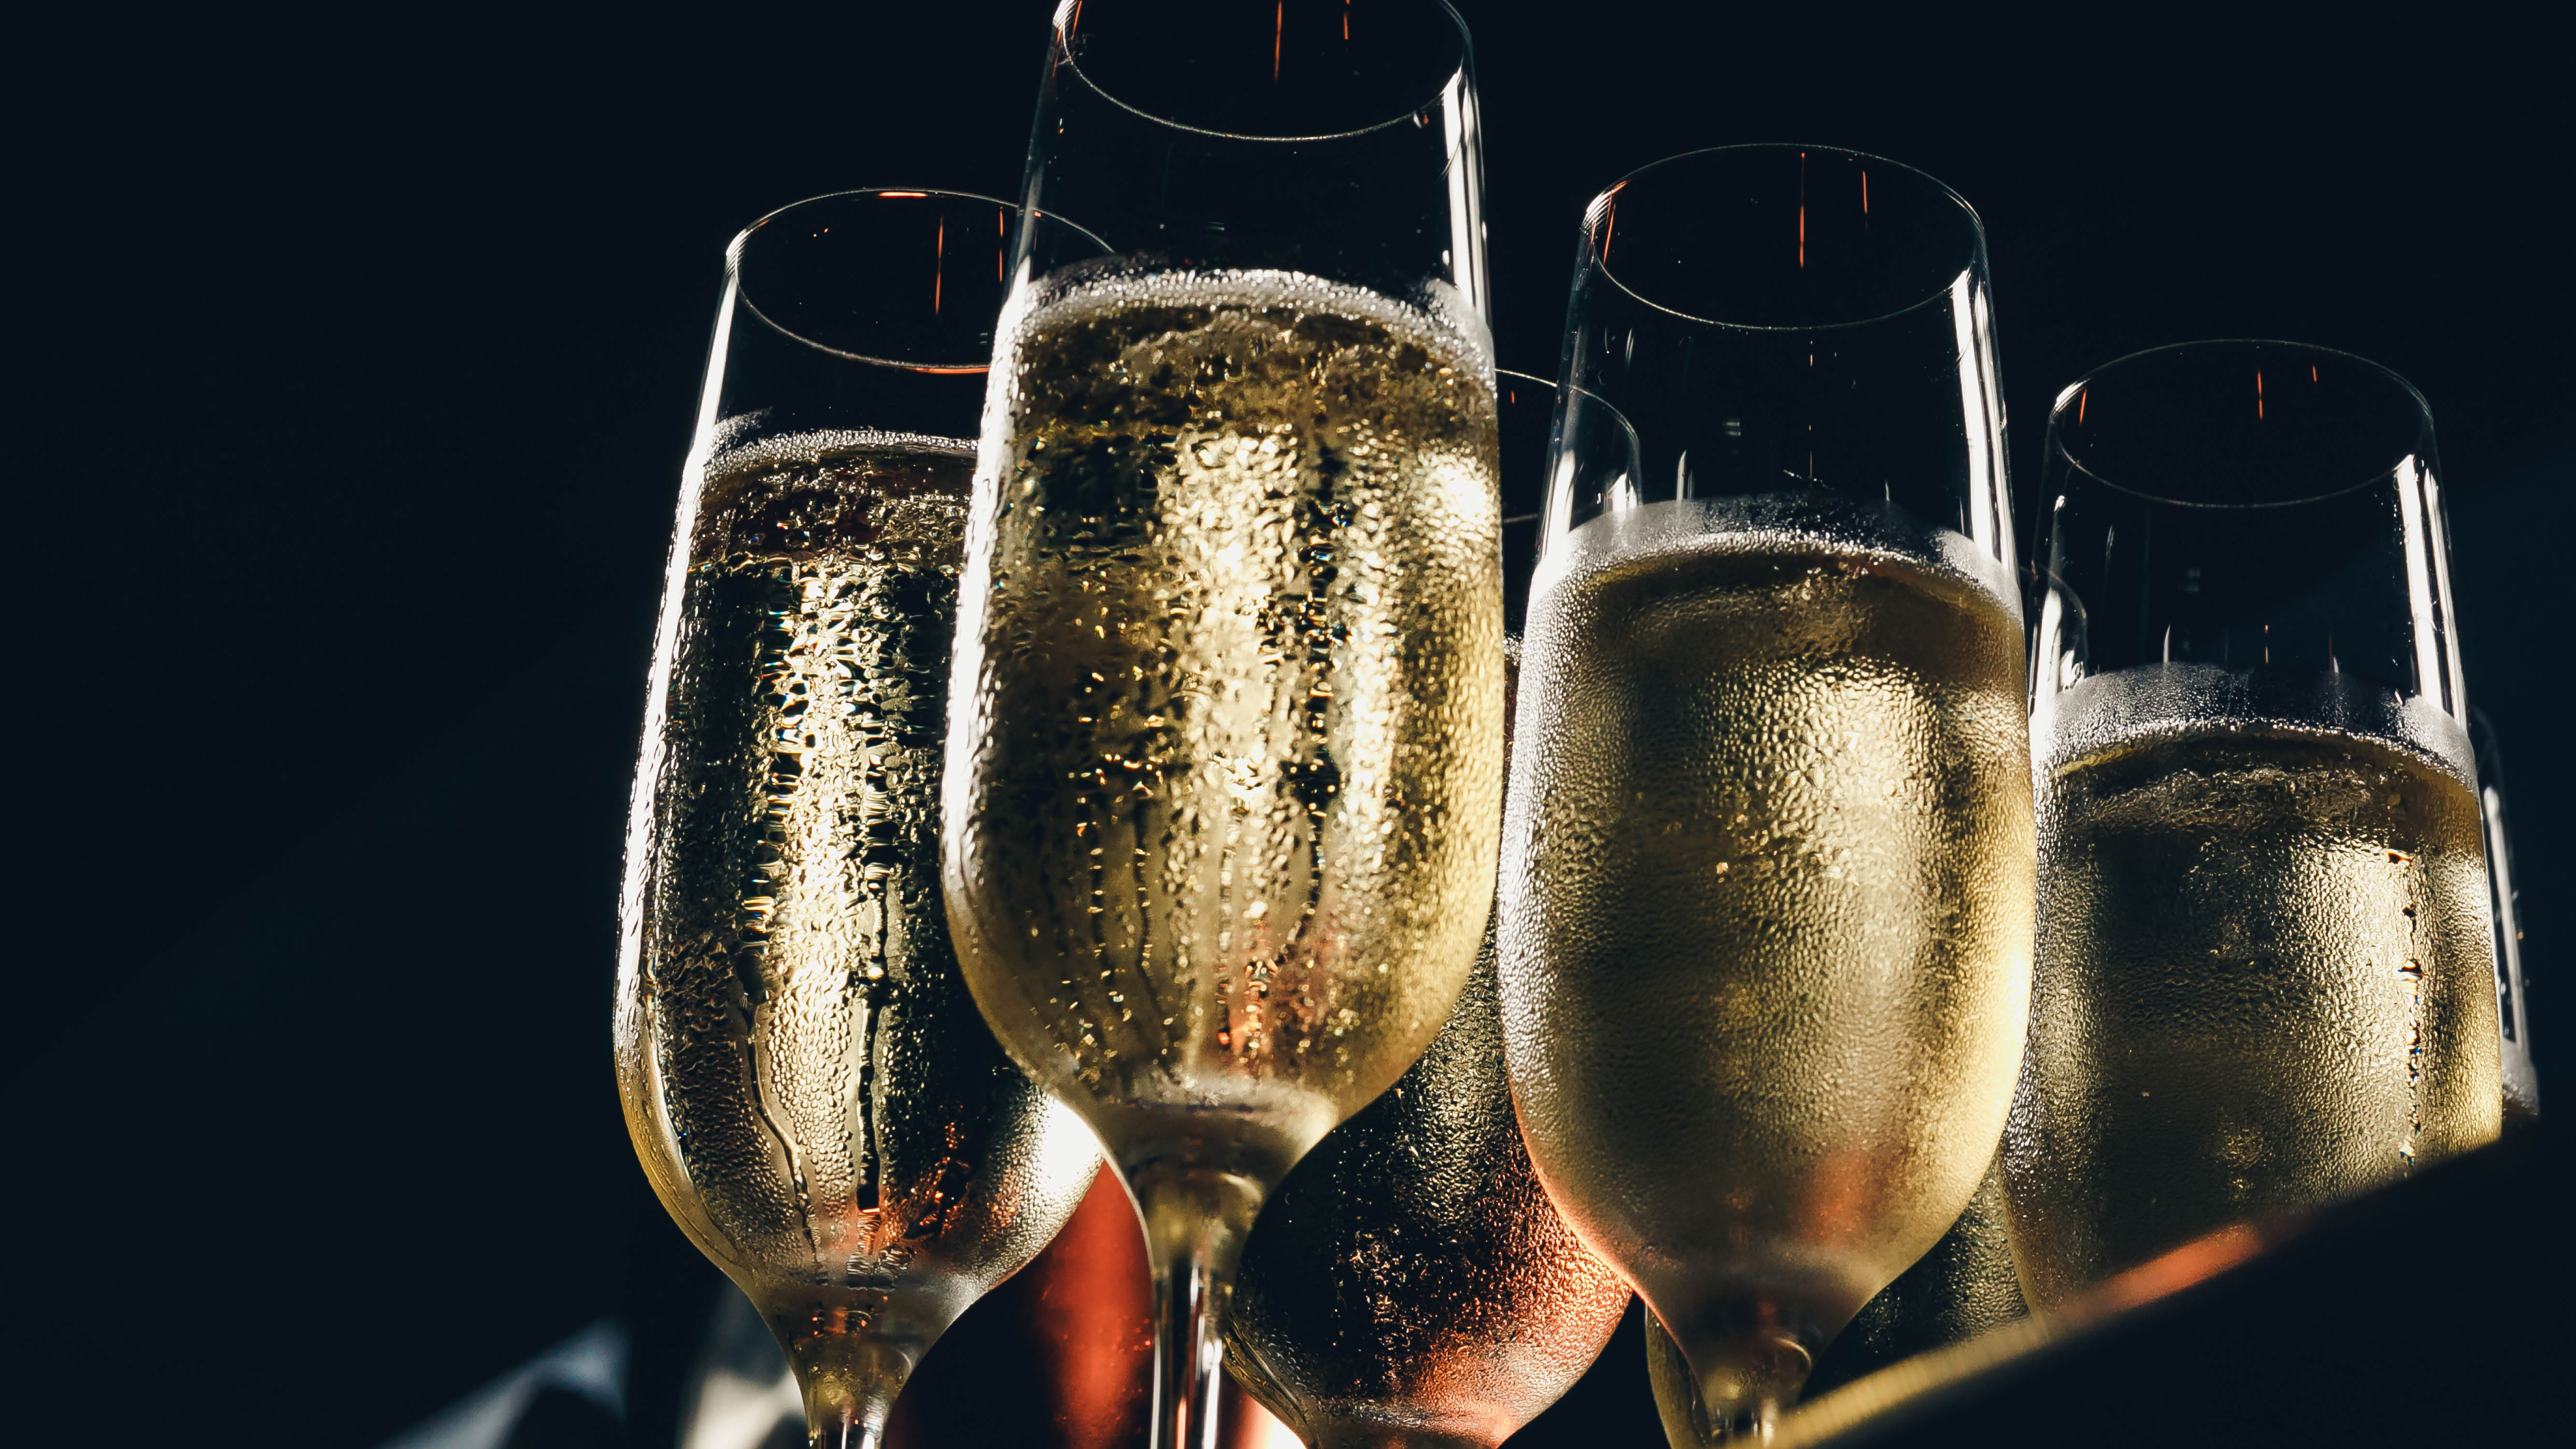 wine-sparkling-wine.jpg